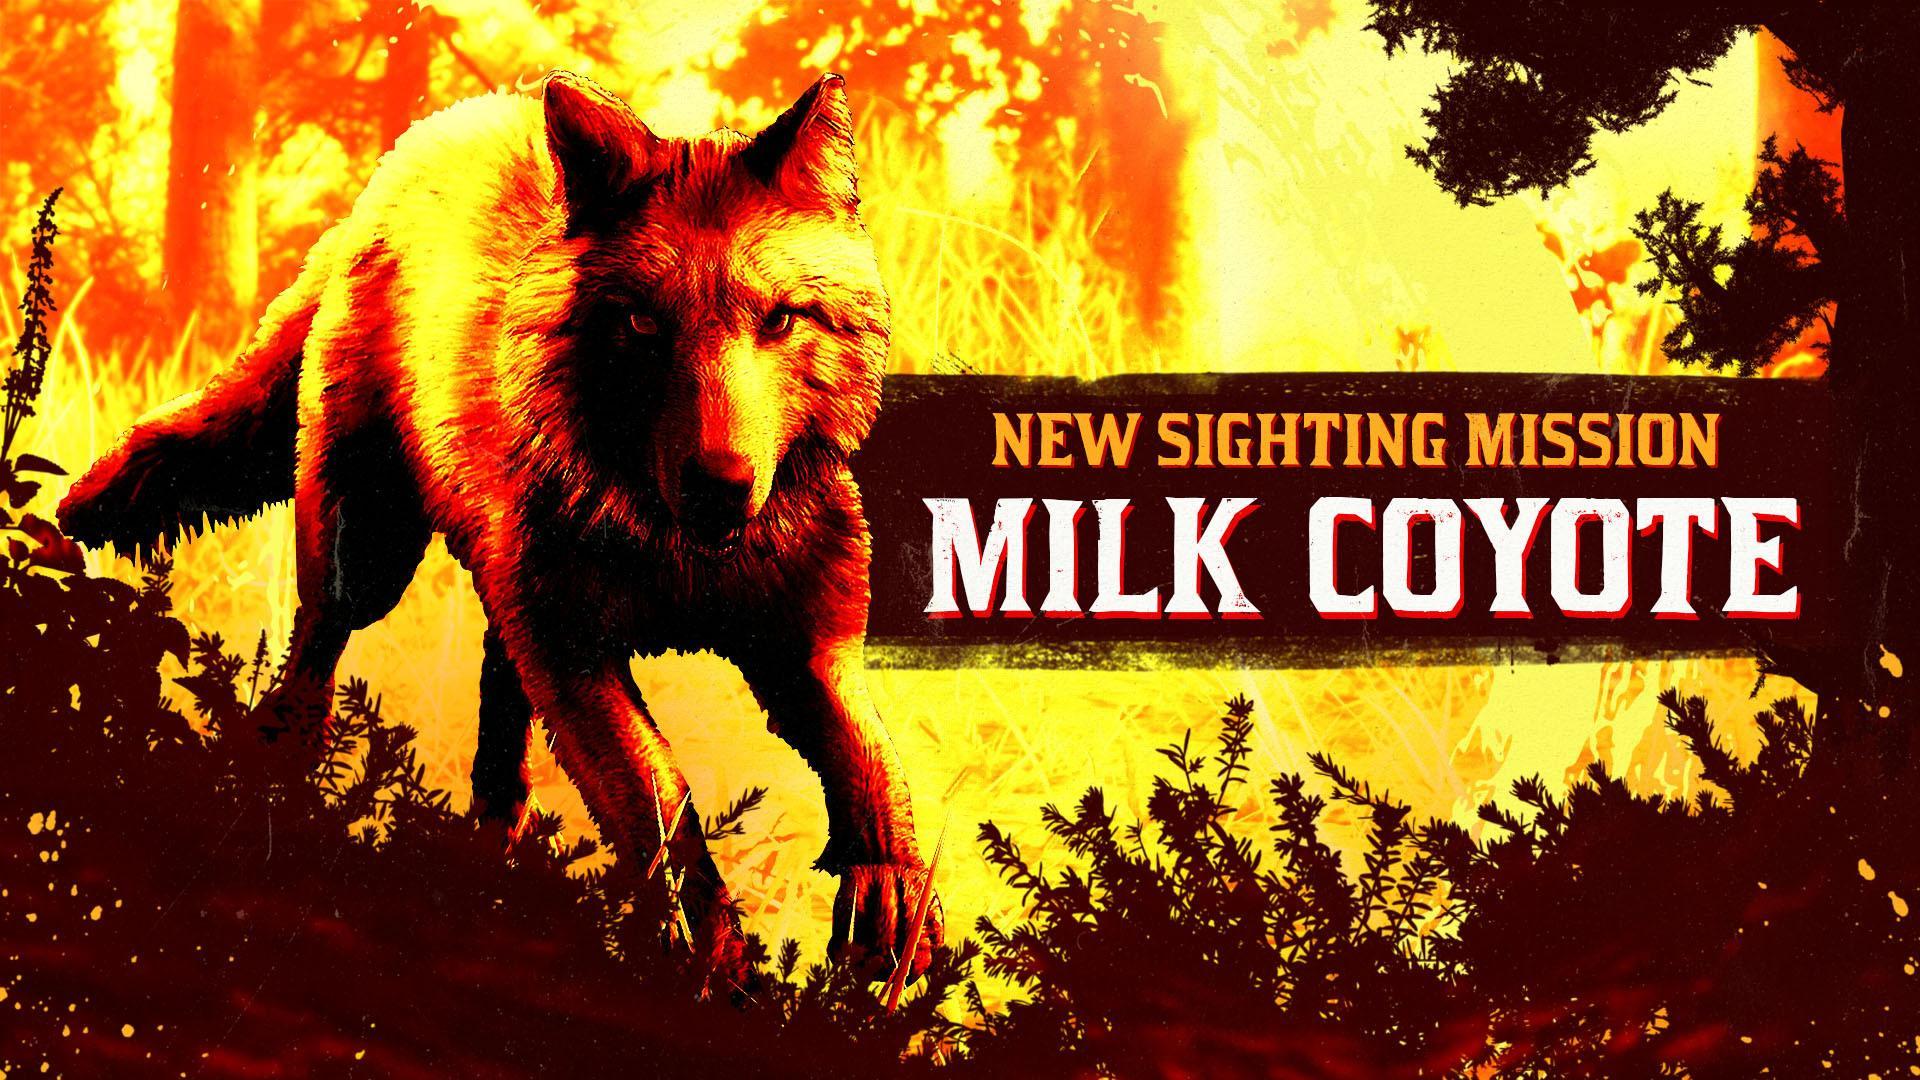 Red Dead Online Adds new Milk Coyote Sighting Target